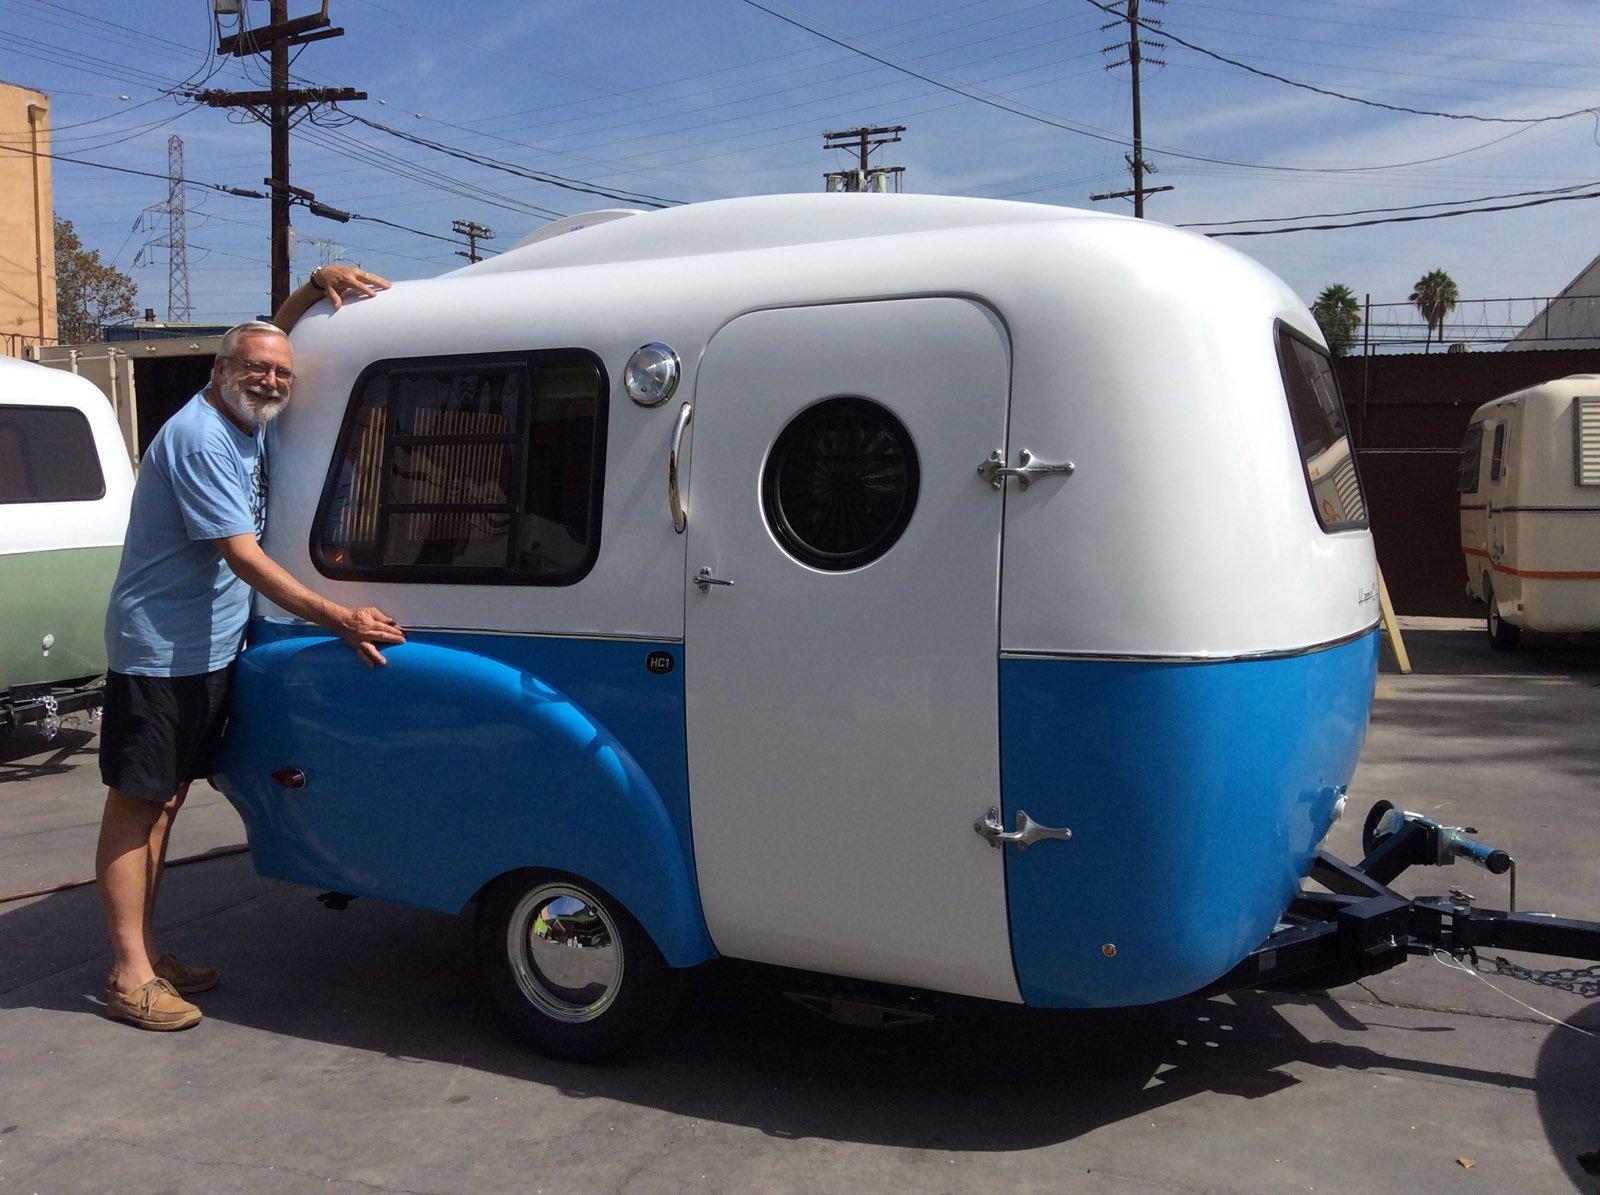 Picked up the Happier Camper HC1 - Fiberglass RV